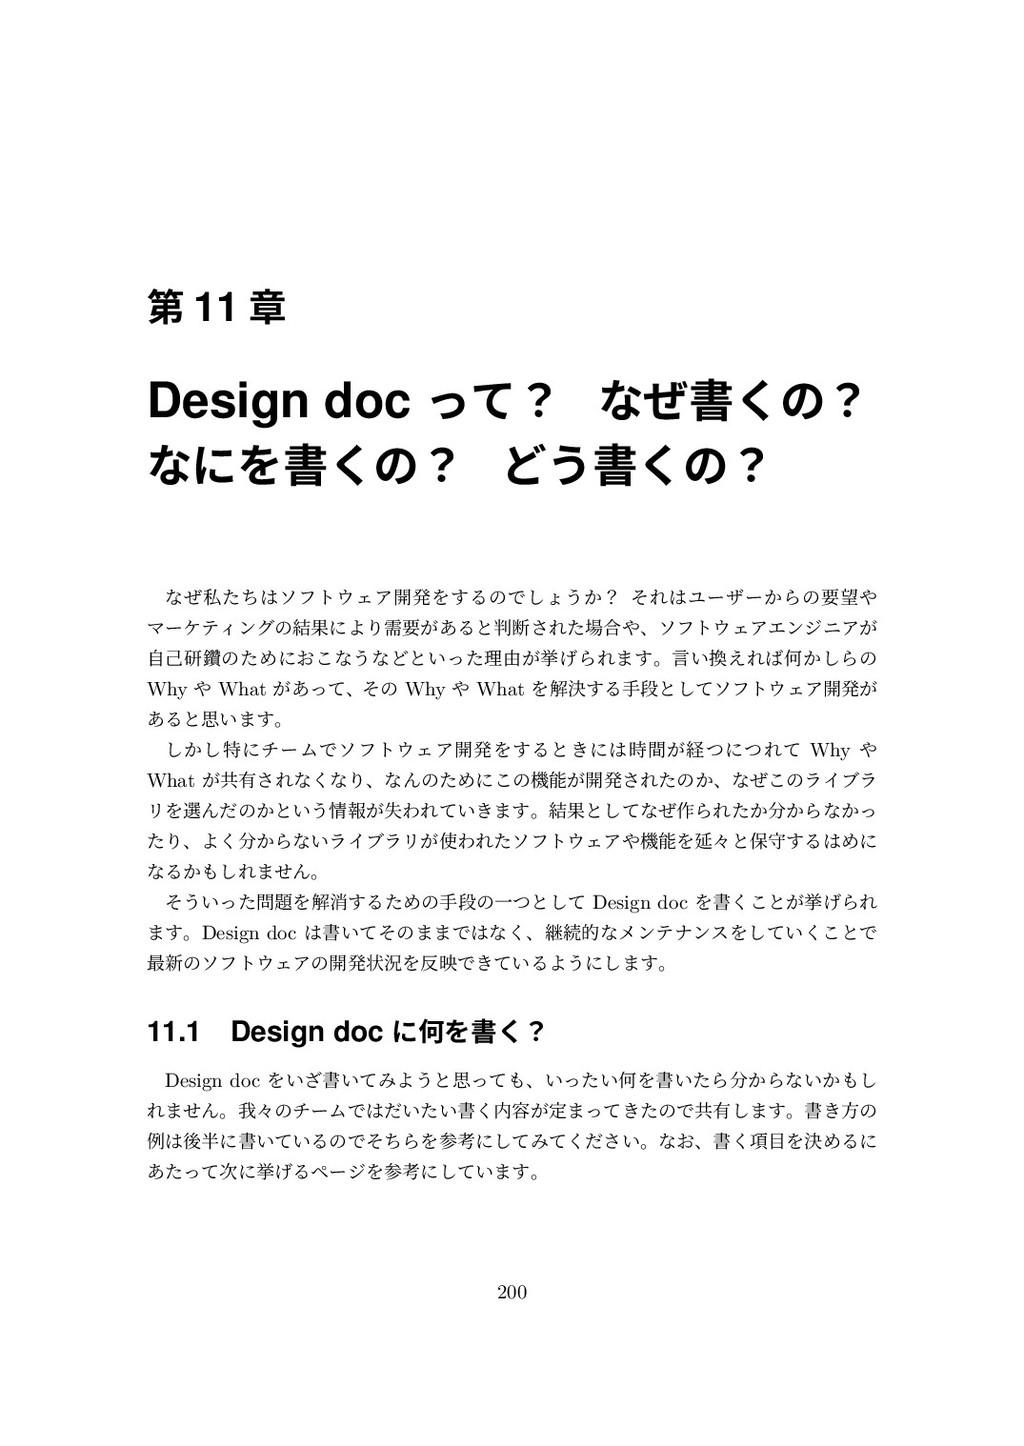 瑬 11 珕 Design doc זי ם傴ׂס םמ傴ׂס לֹ傴ׂס ם瑭...